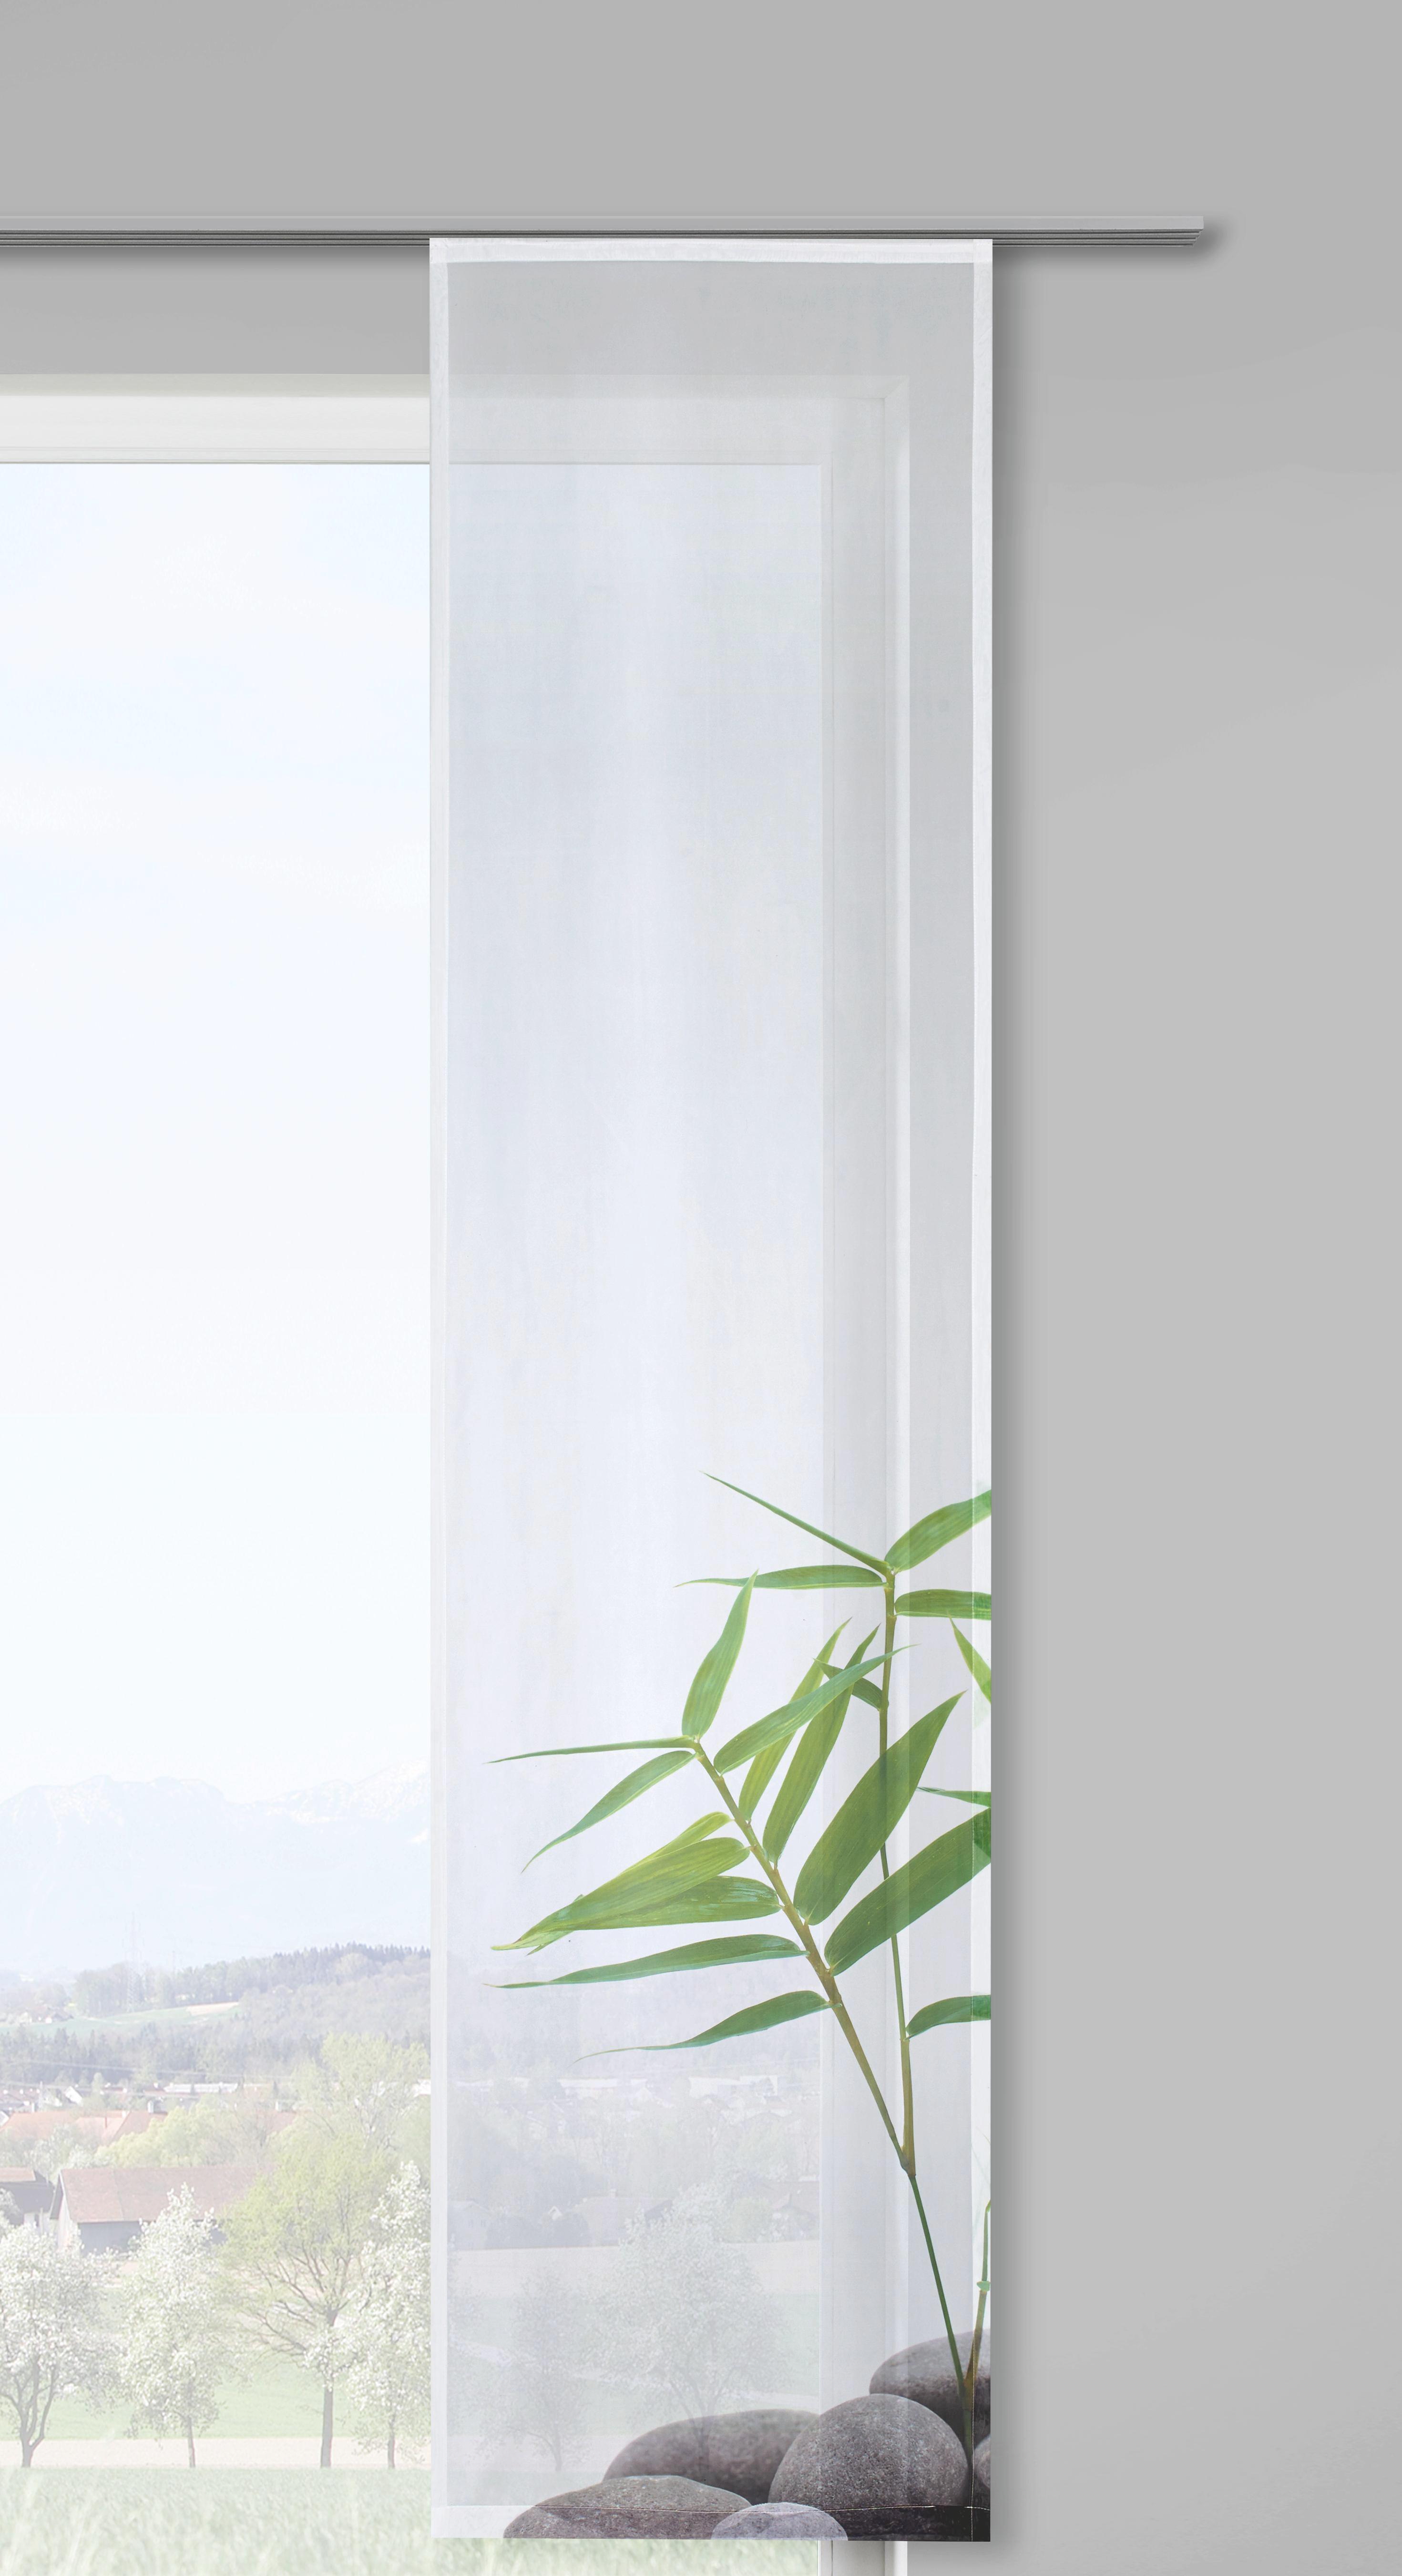 Flächenvorhang Spa, ca. 60x245cm - Weiß/Grau, LIFESTYLE, Textil (60/245cm) - MÖMAX modern living